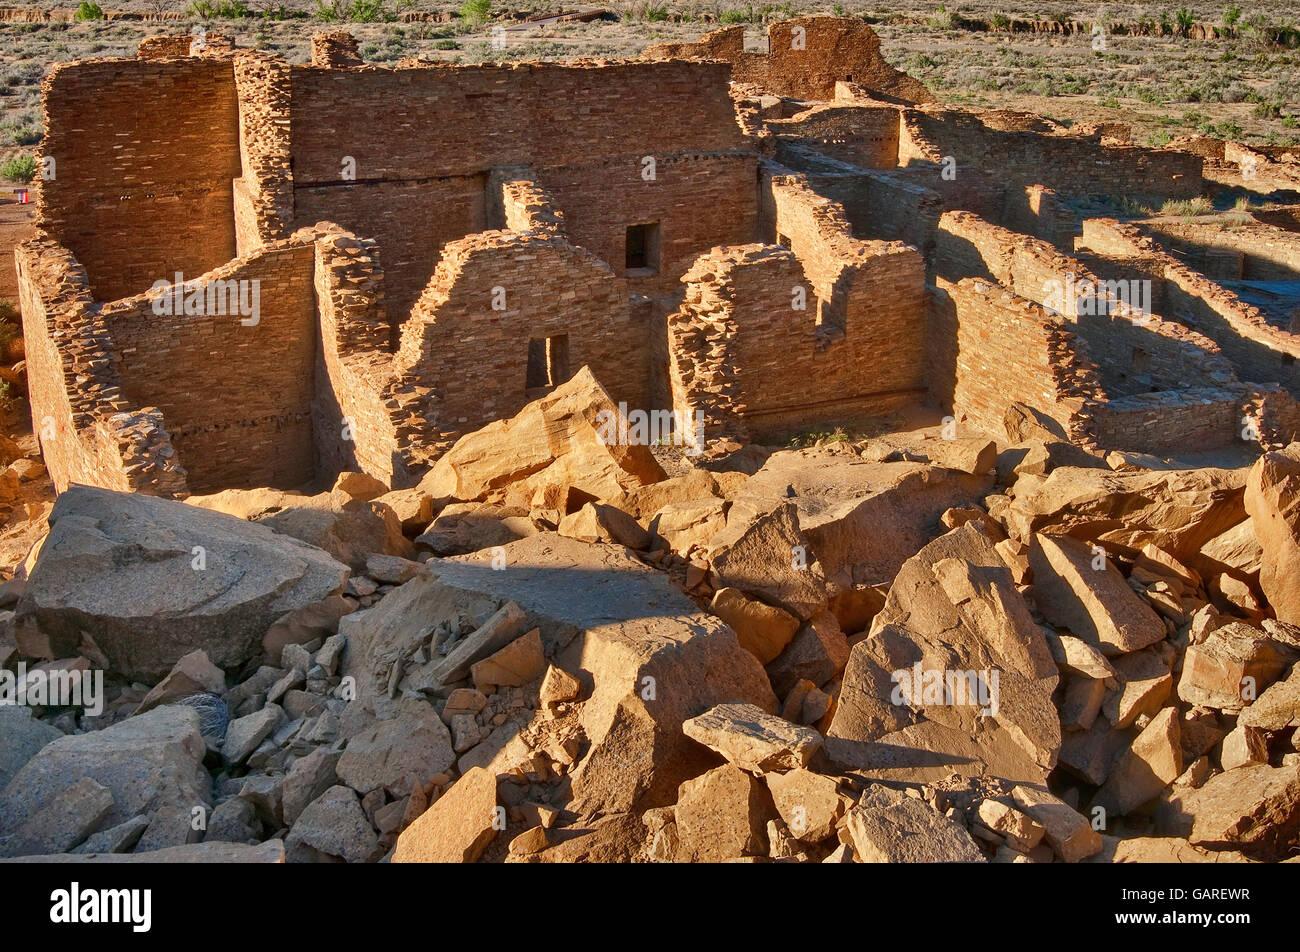 Pueblo Bonito, Anasazi Indian ruins, Chaco Culture National Historical Park, New Mexico, USA Stock Photo